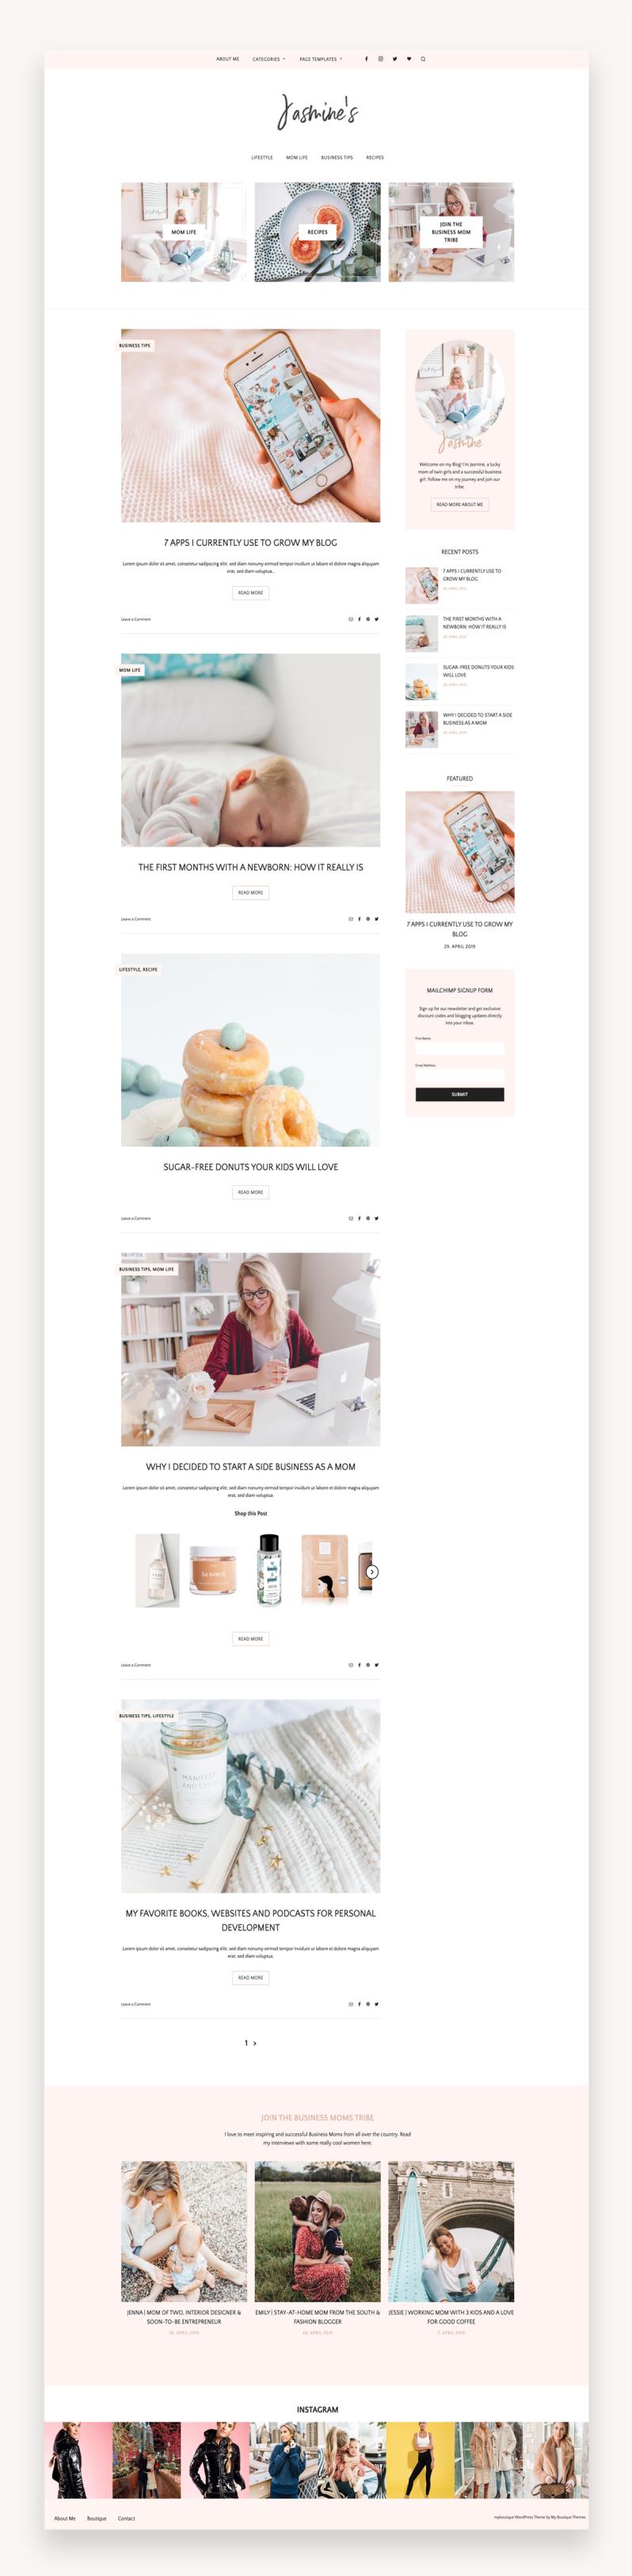 Feminine Blog and Shop Theme - Jasmine